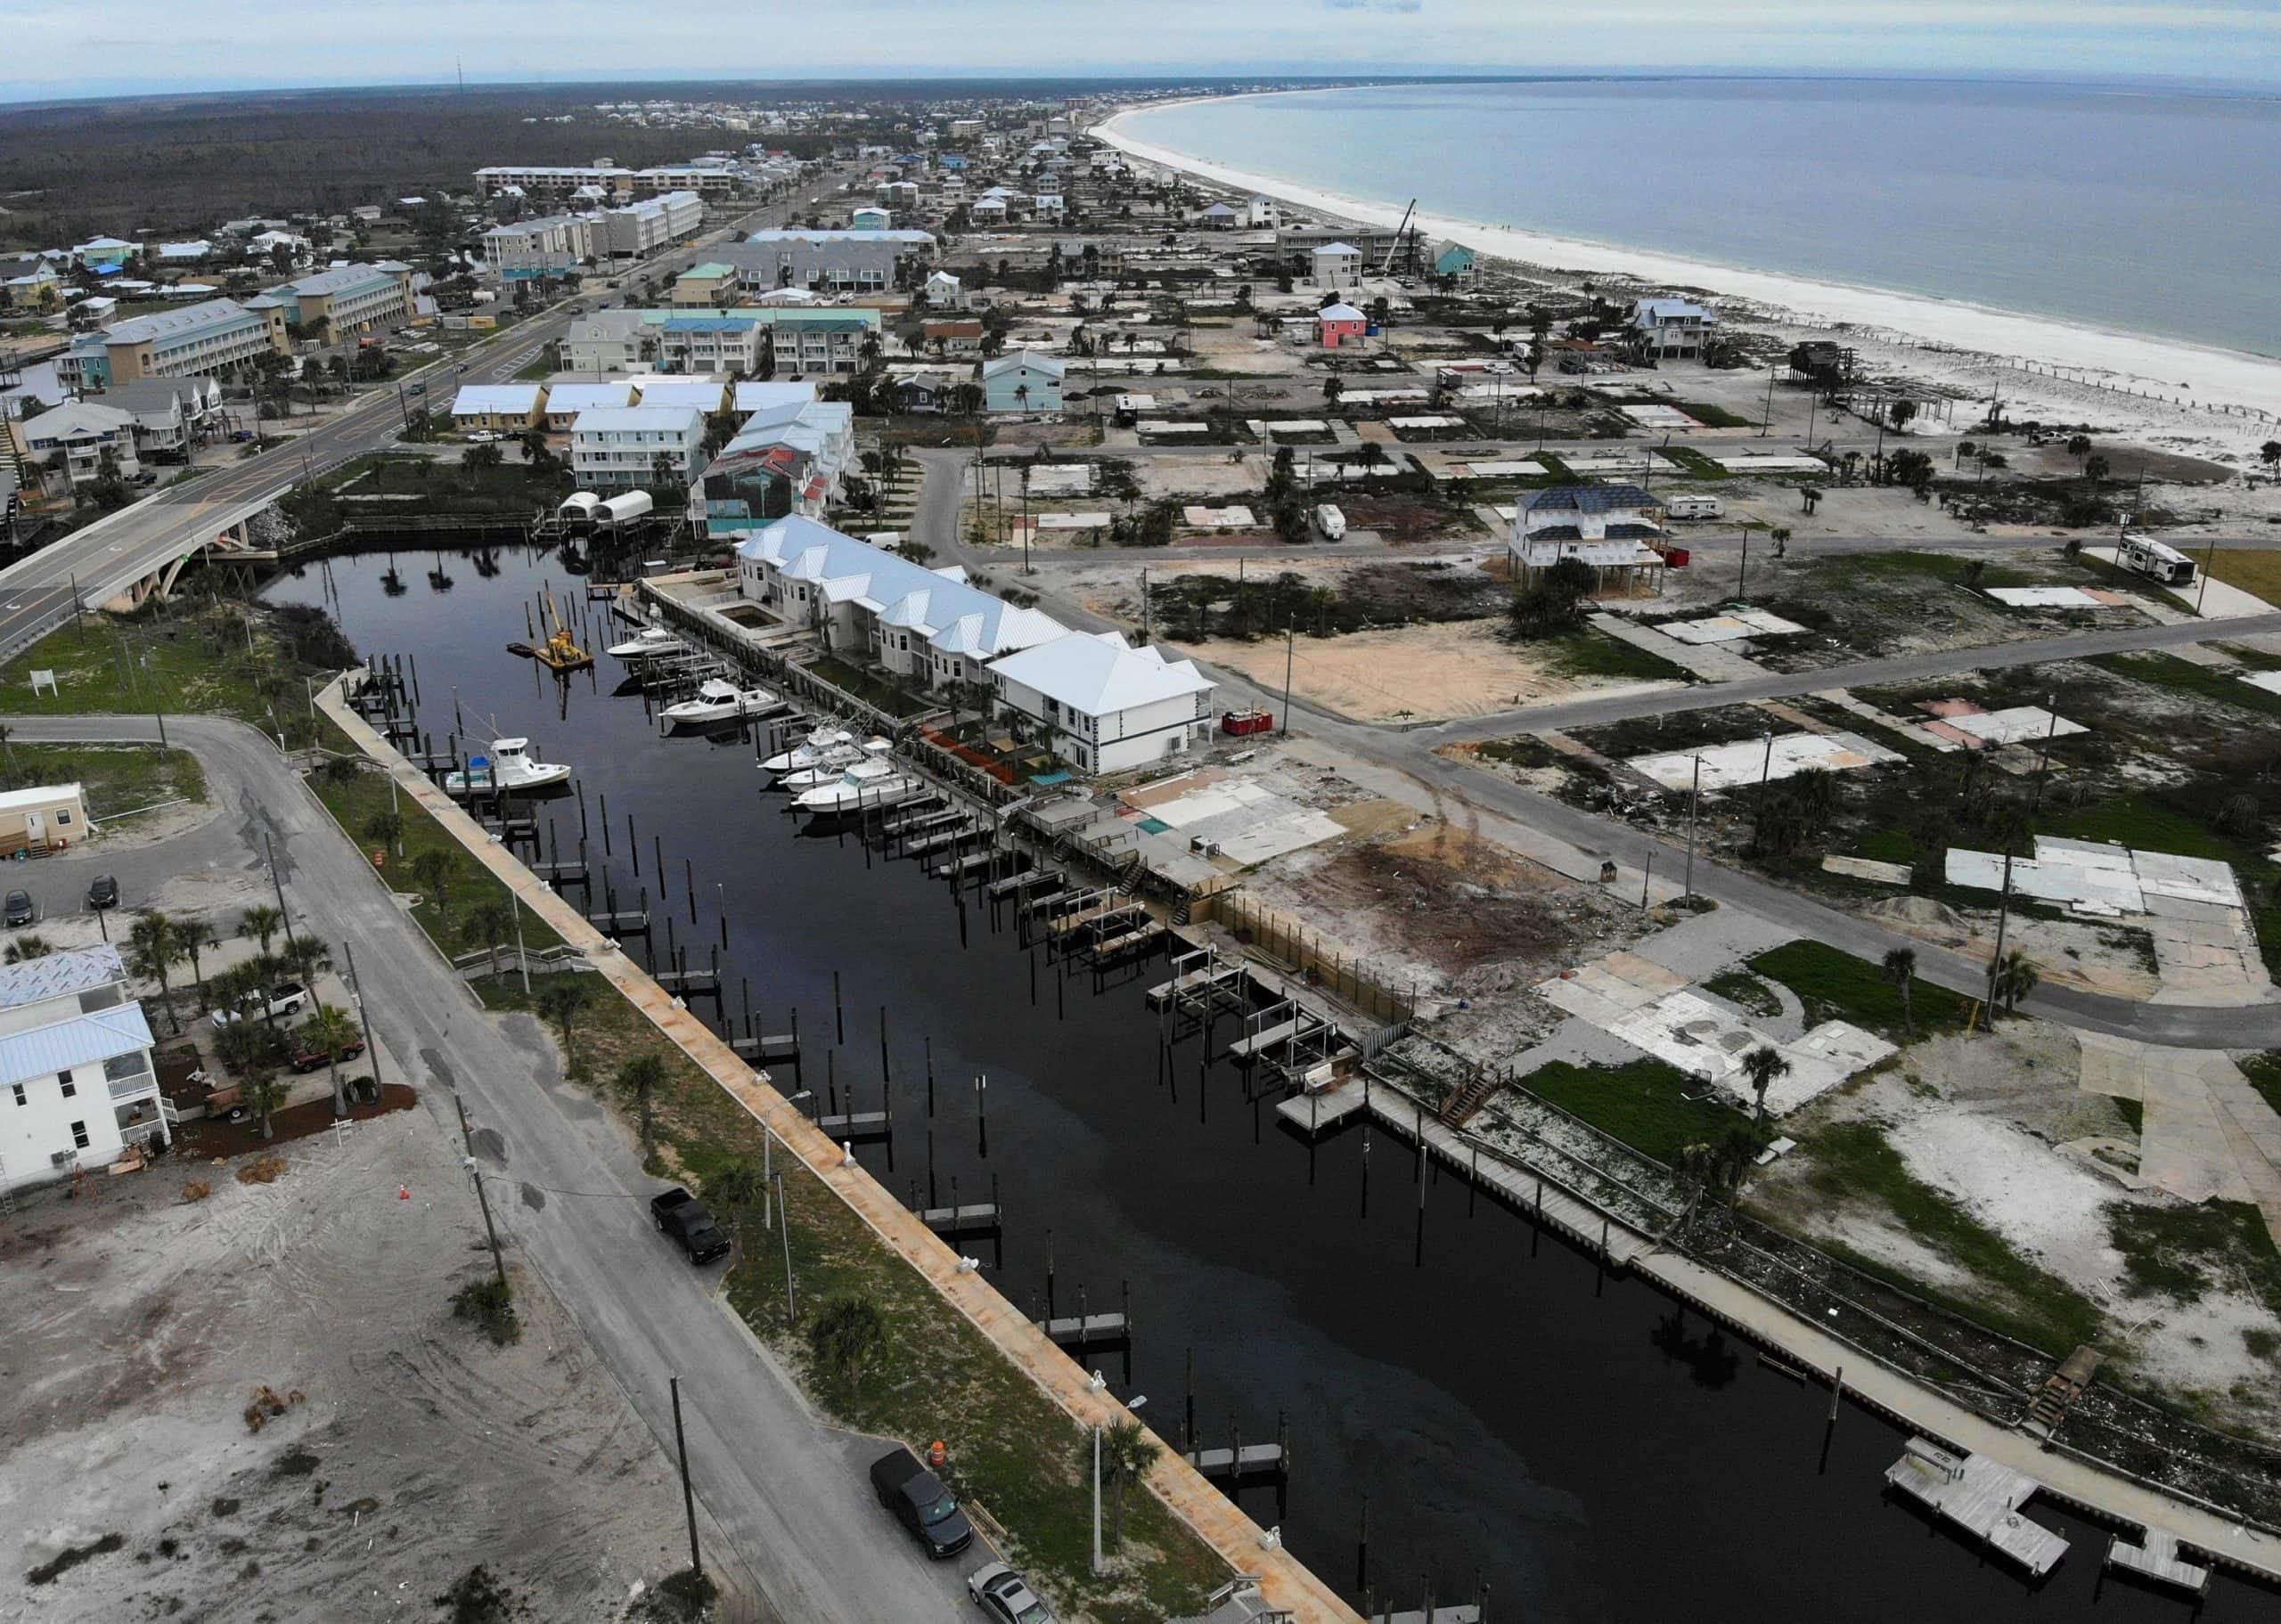 mexico-beach-scaled.jpg